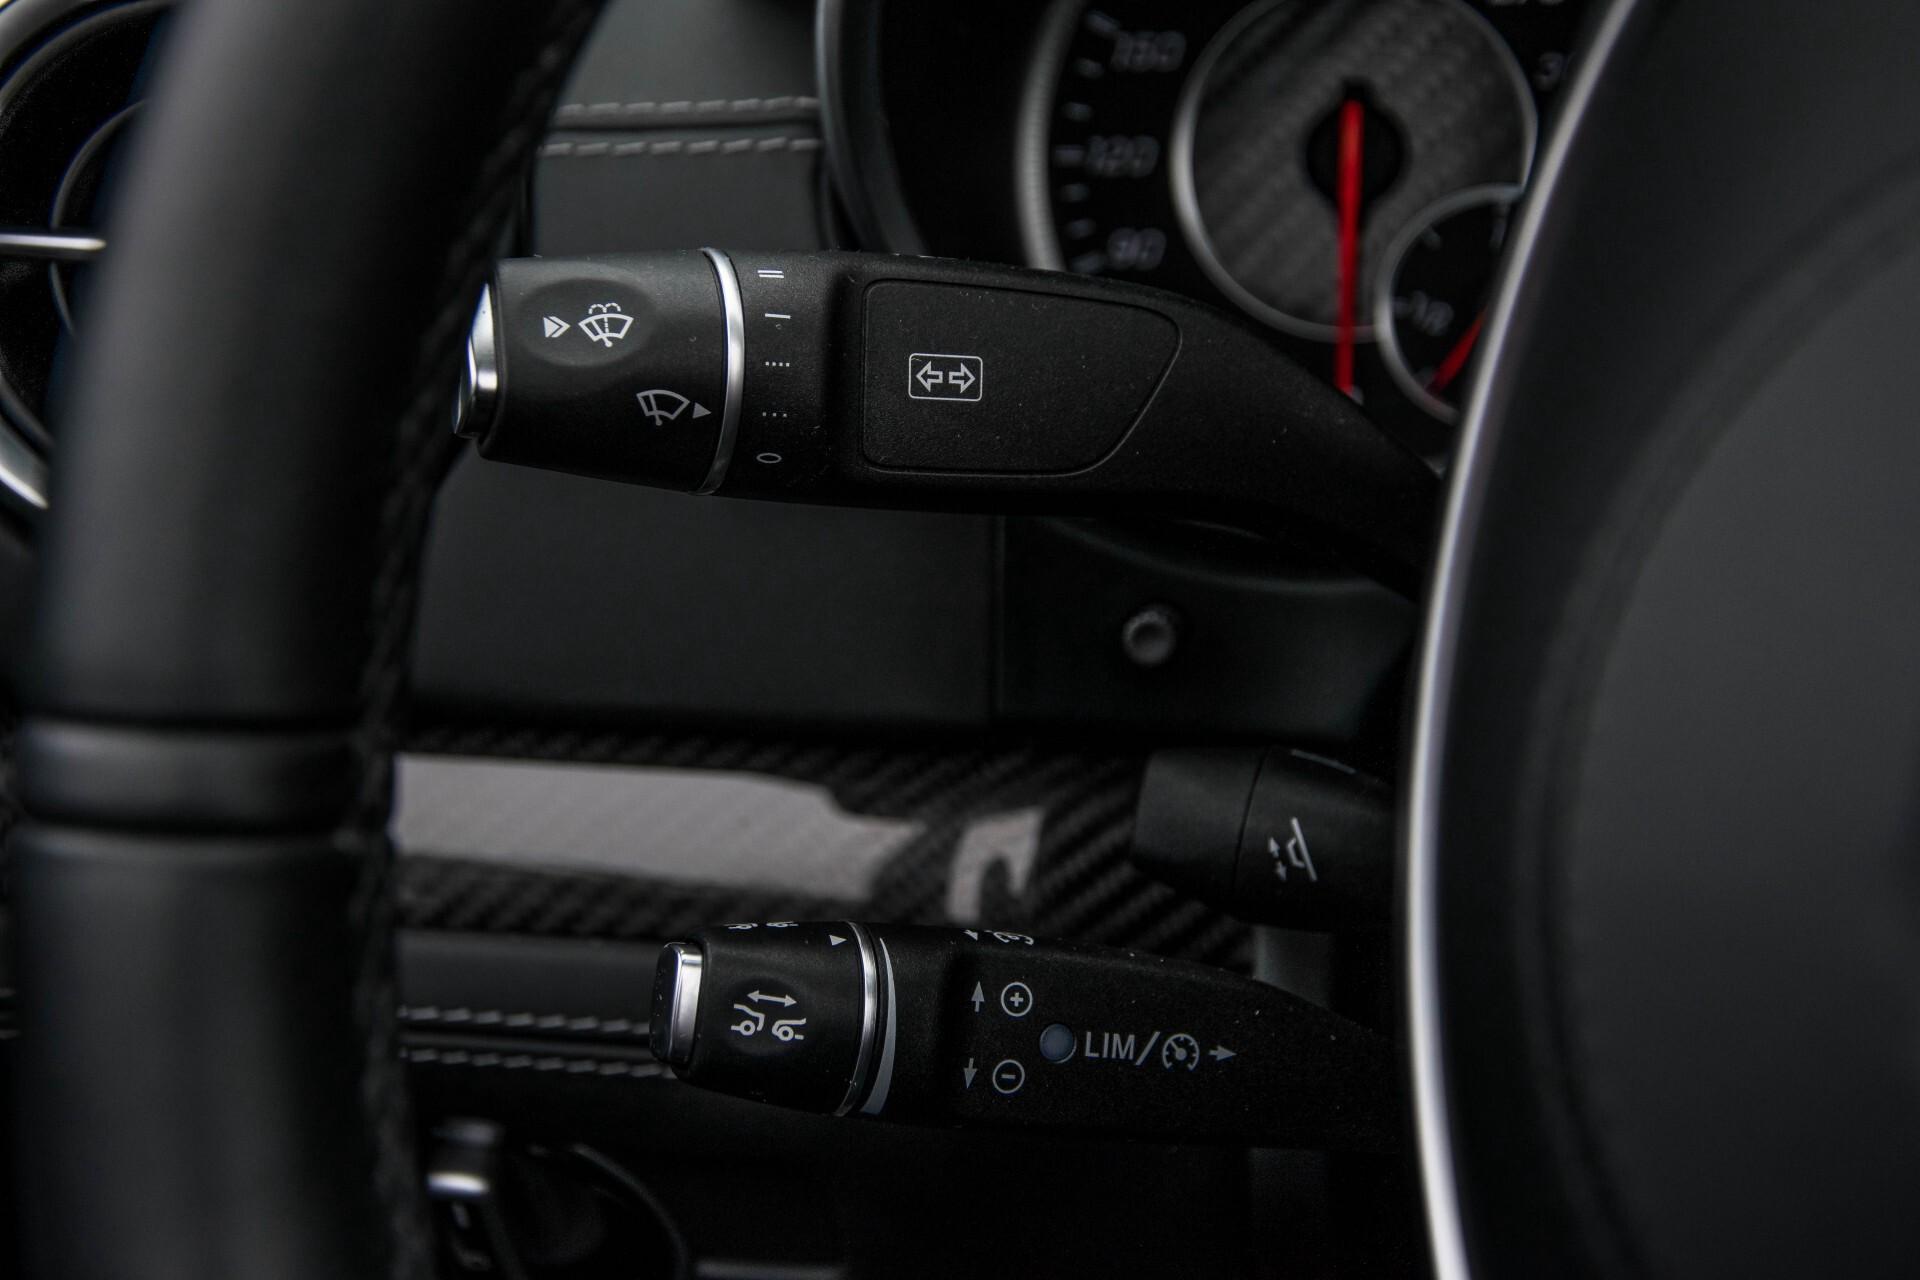 Mercedes-Benz SL-Klasse 63 AMG Keramisch/Bang & Olufsen/Designo/Carbon/Drivers Package Aut7 Foto 11